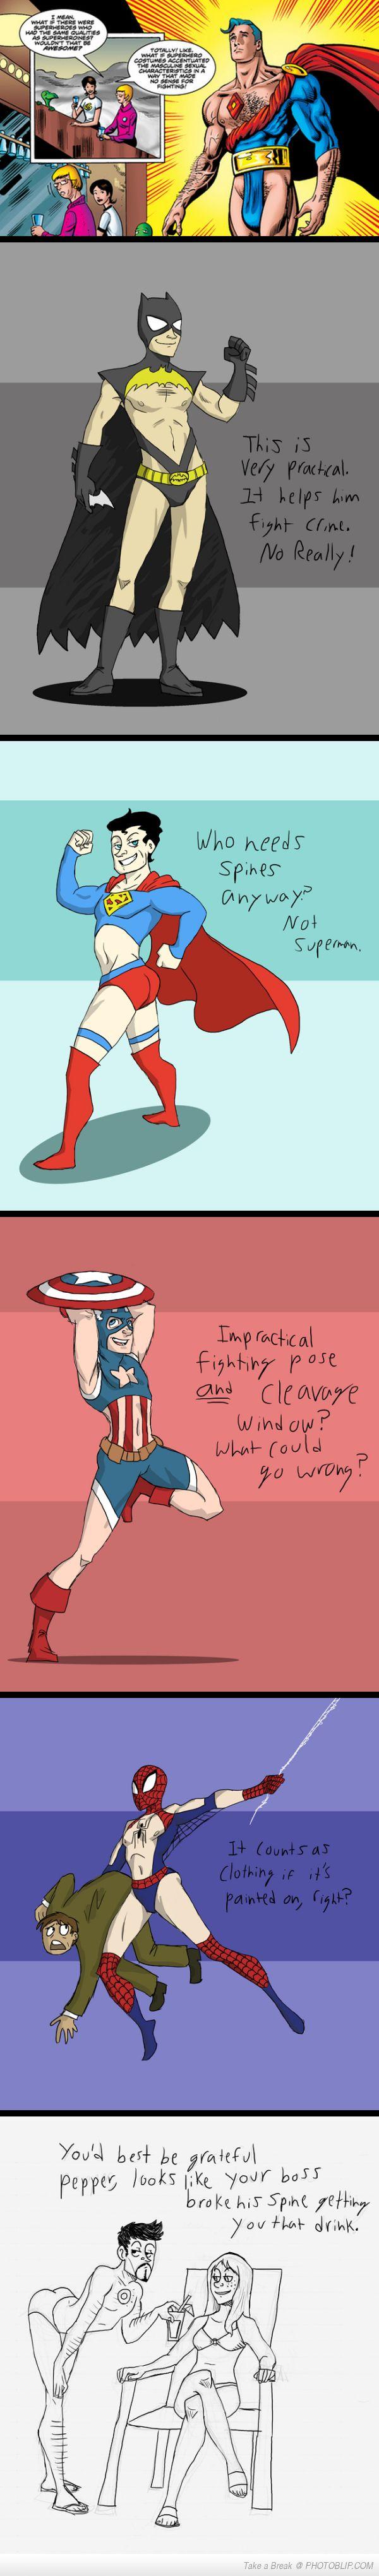 If Male Superhero Costumes Were Designed Like The Females